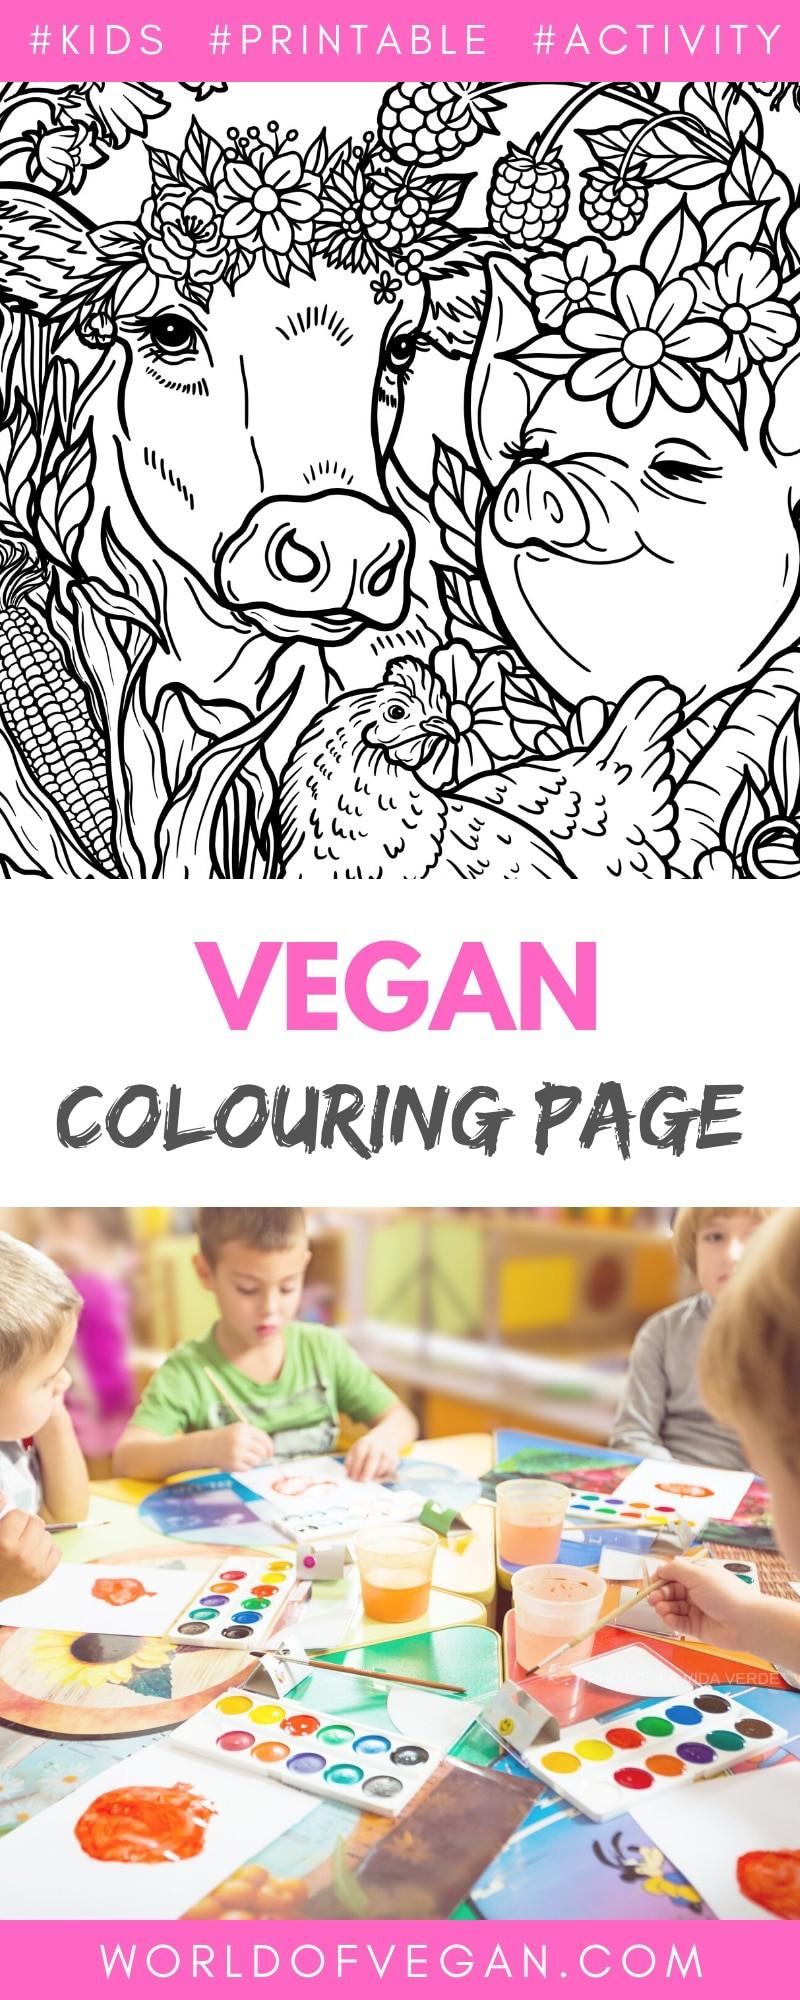 Vegan Coloring Book for Kids - Small Preview - WorldofVegan.com | #kids #vegan #art #colouring #activity #mindfulness #worldofvegan